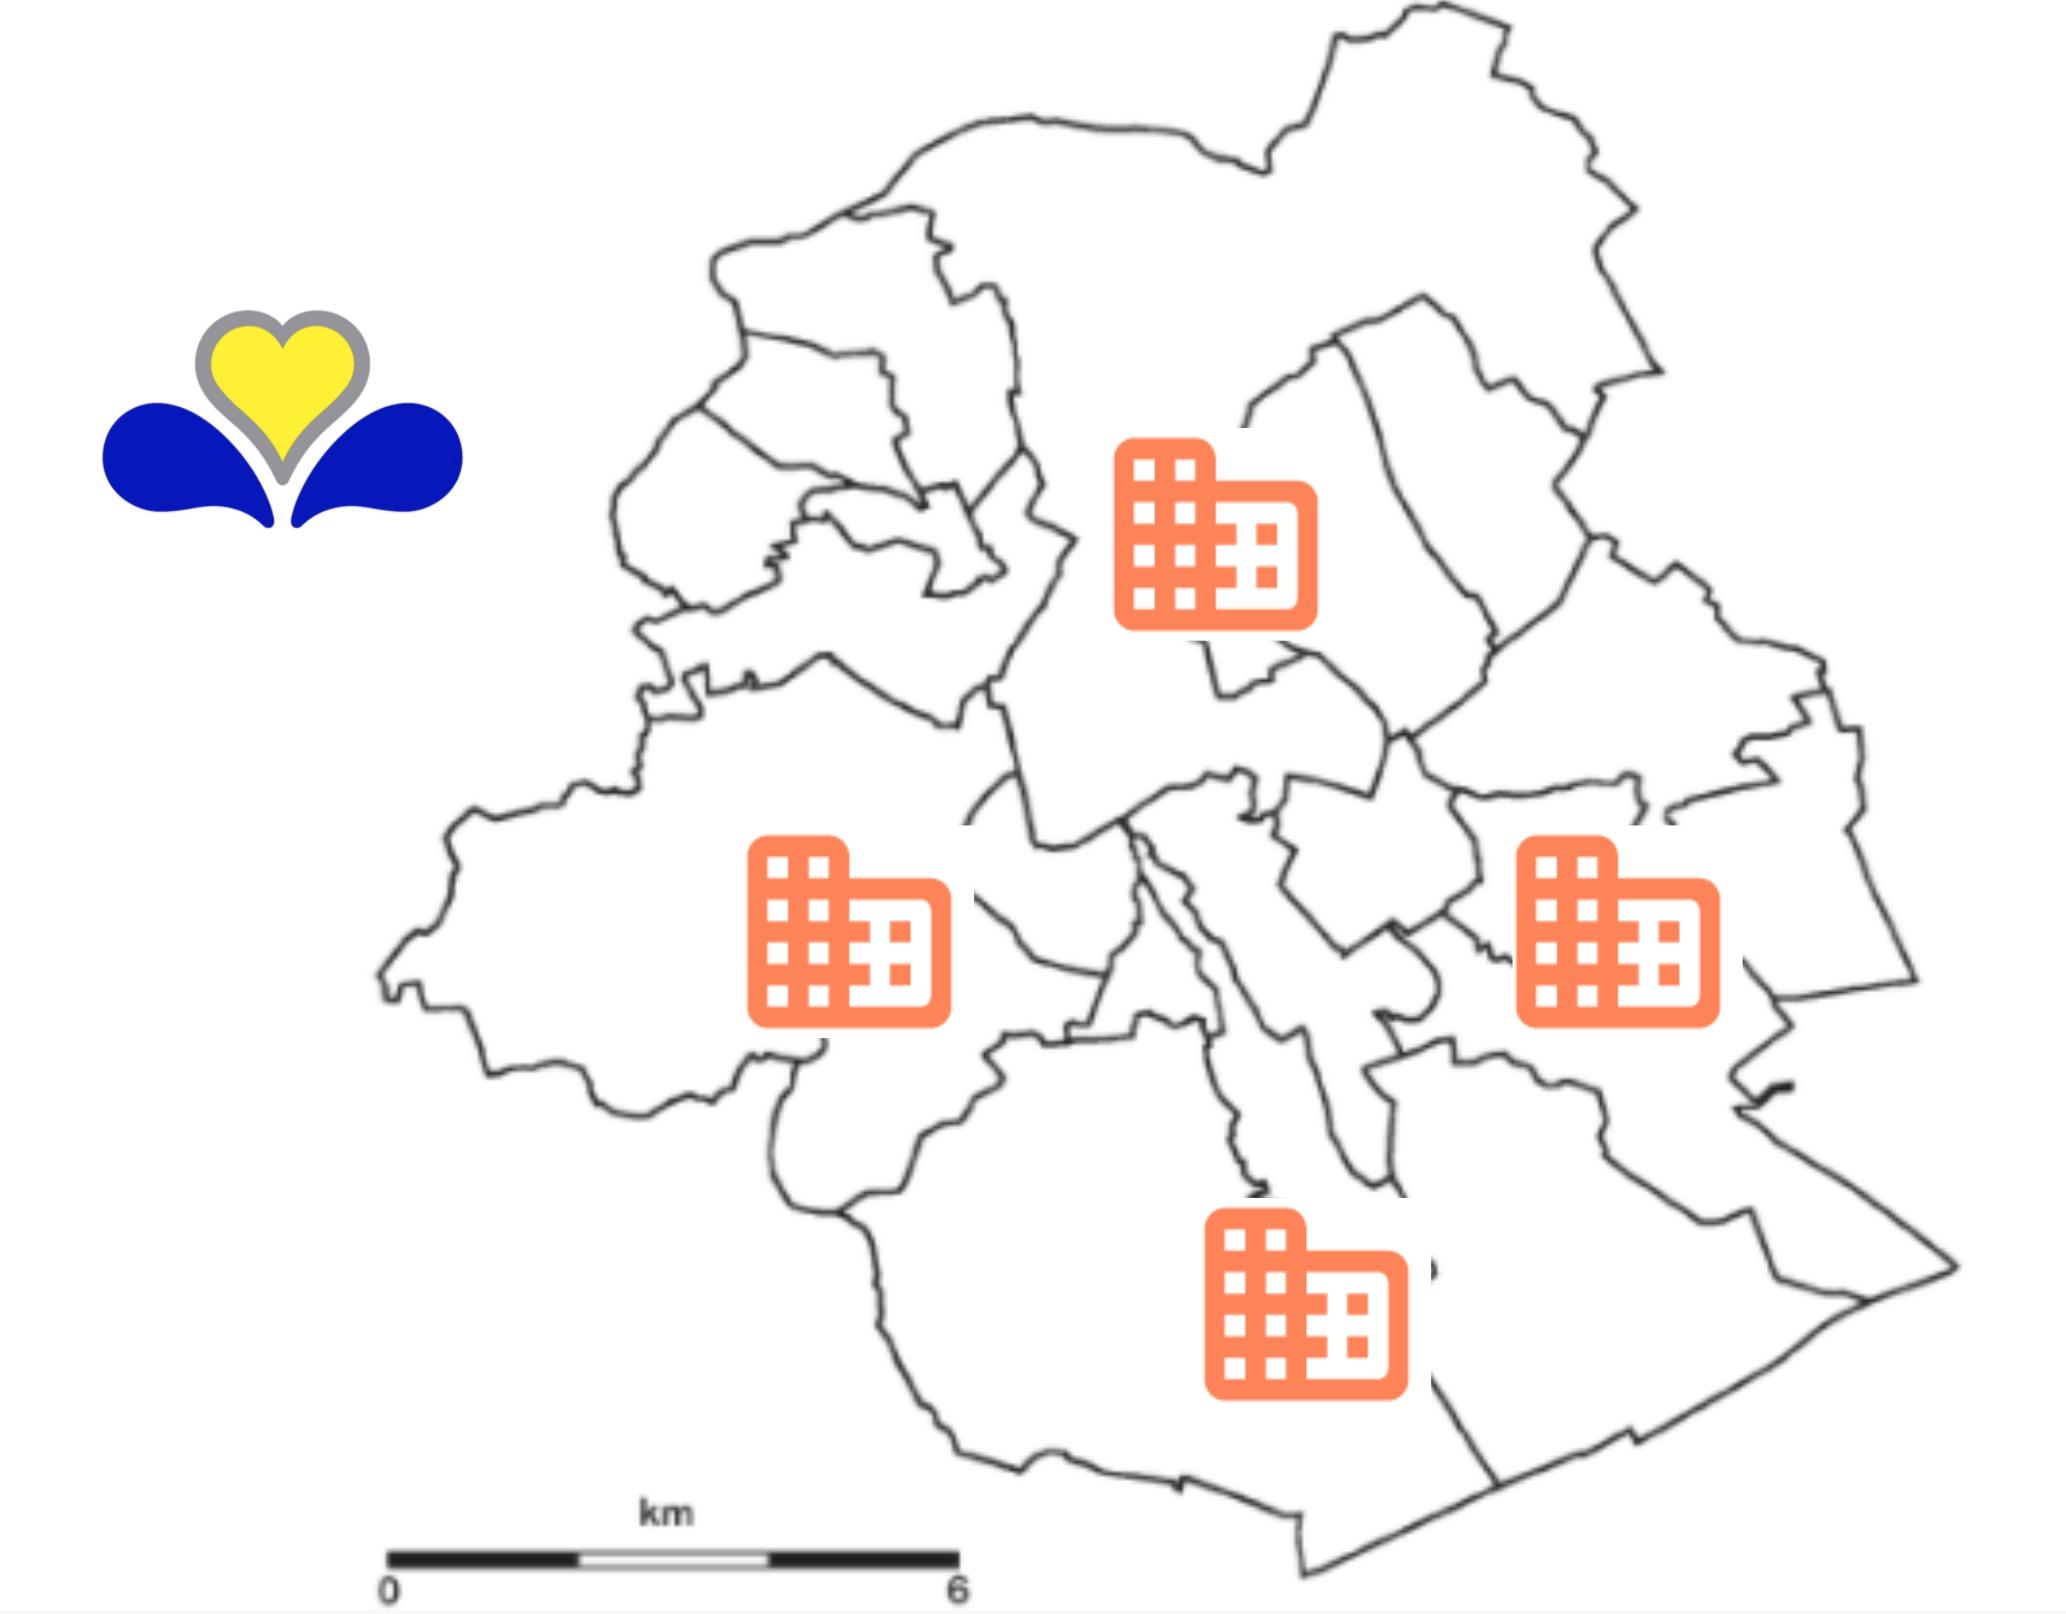 Brussel Proxi-lening